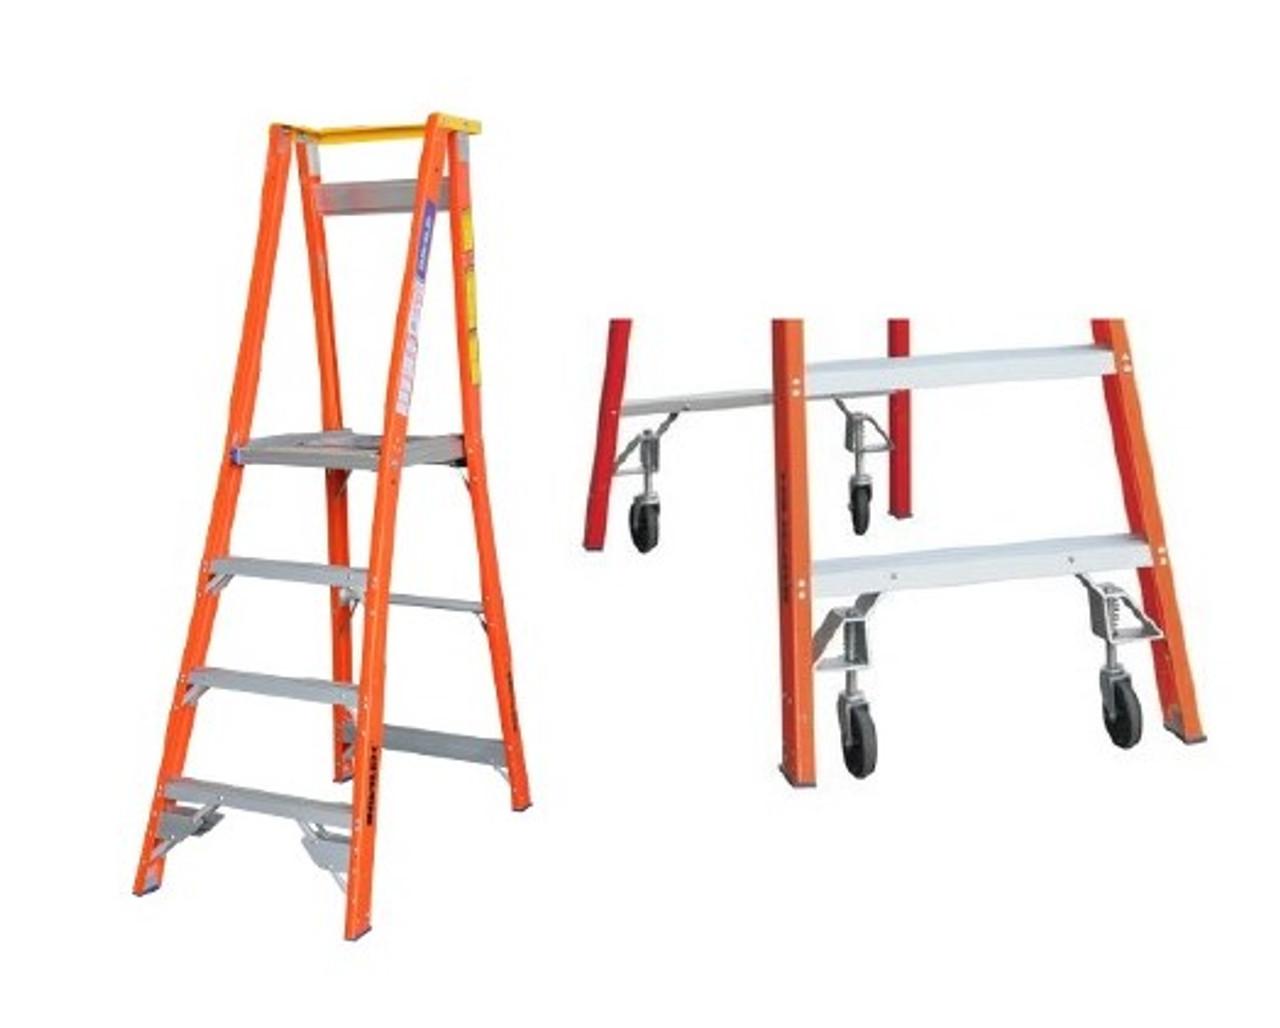 Pro Series Fibreglass Platformpodium Ladder With Spring Loaded Wheel Kit